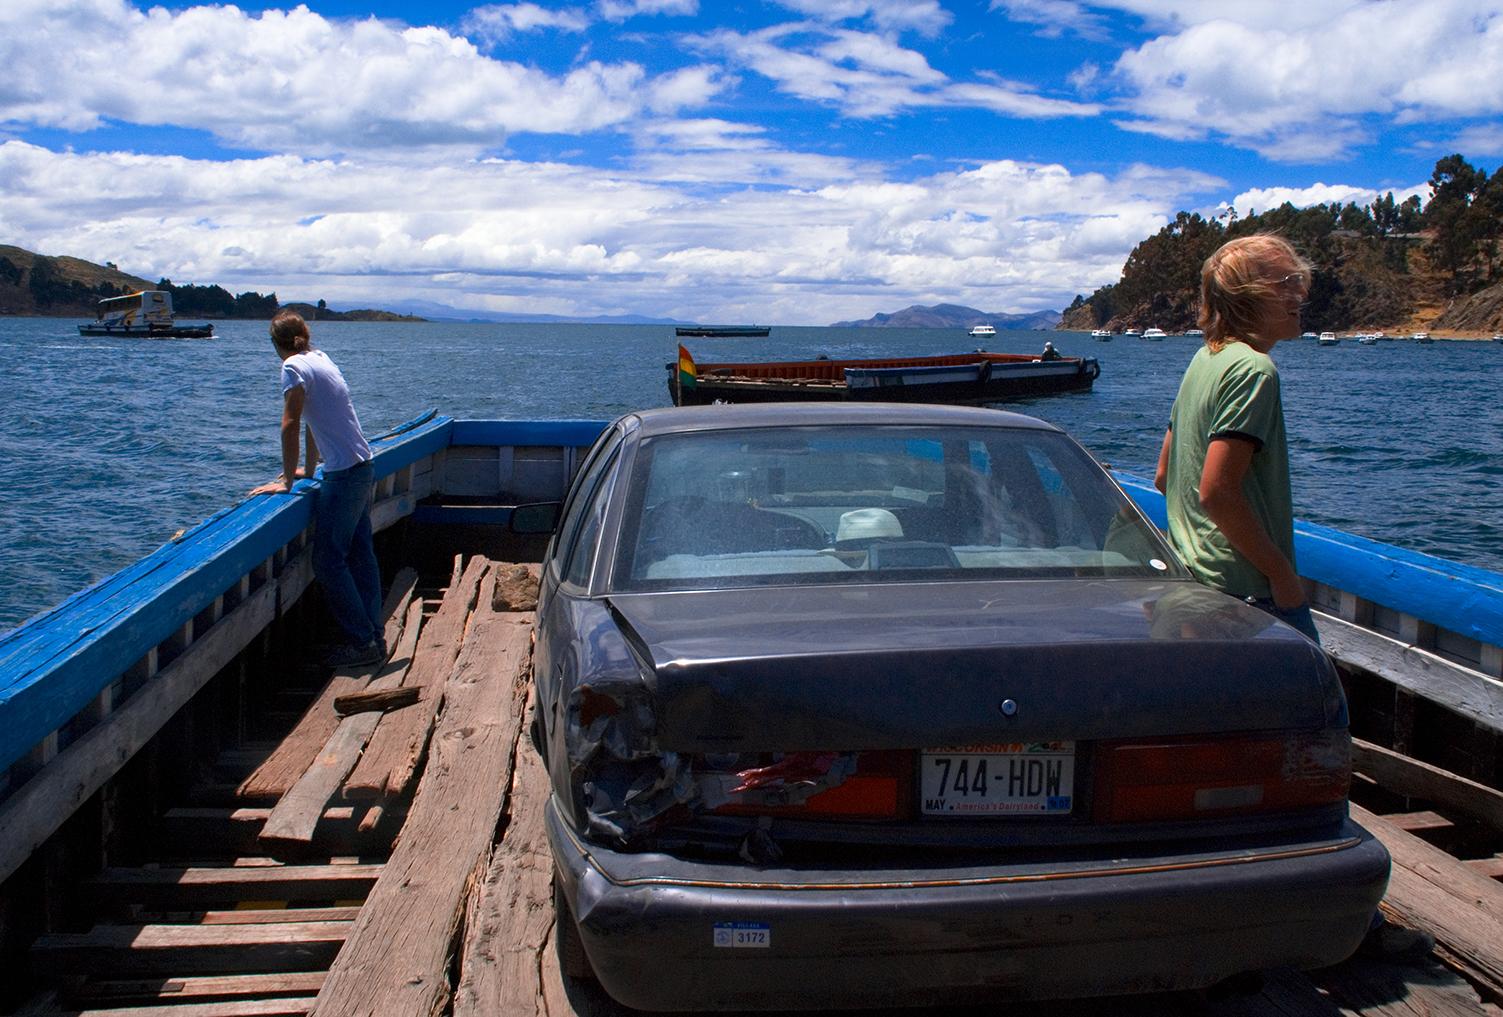 Fording Lake Titicaca